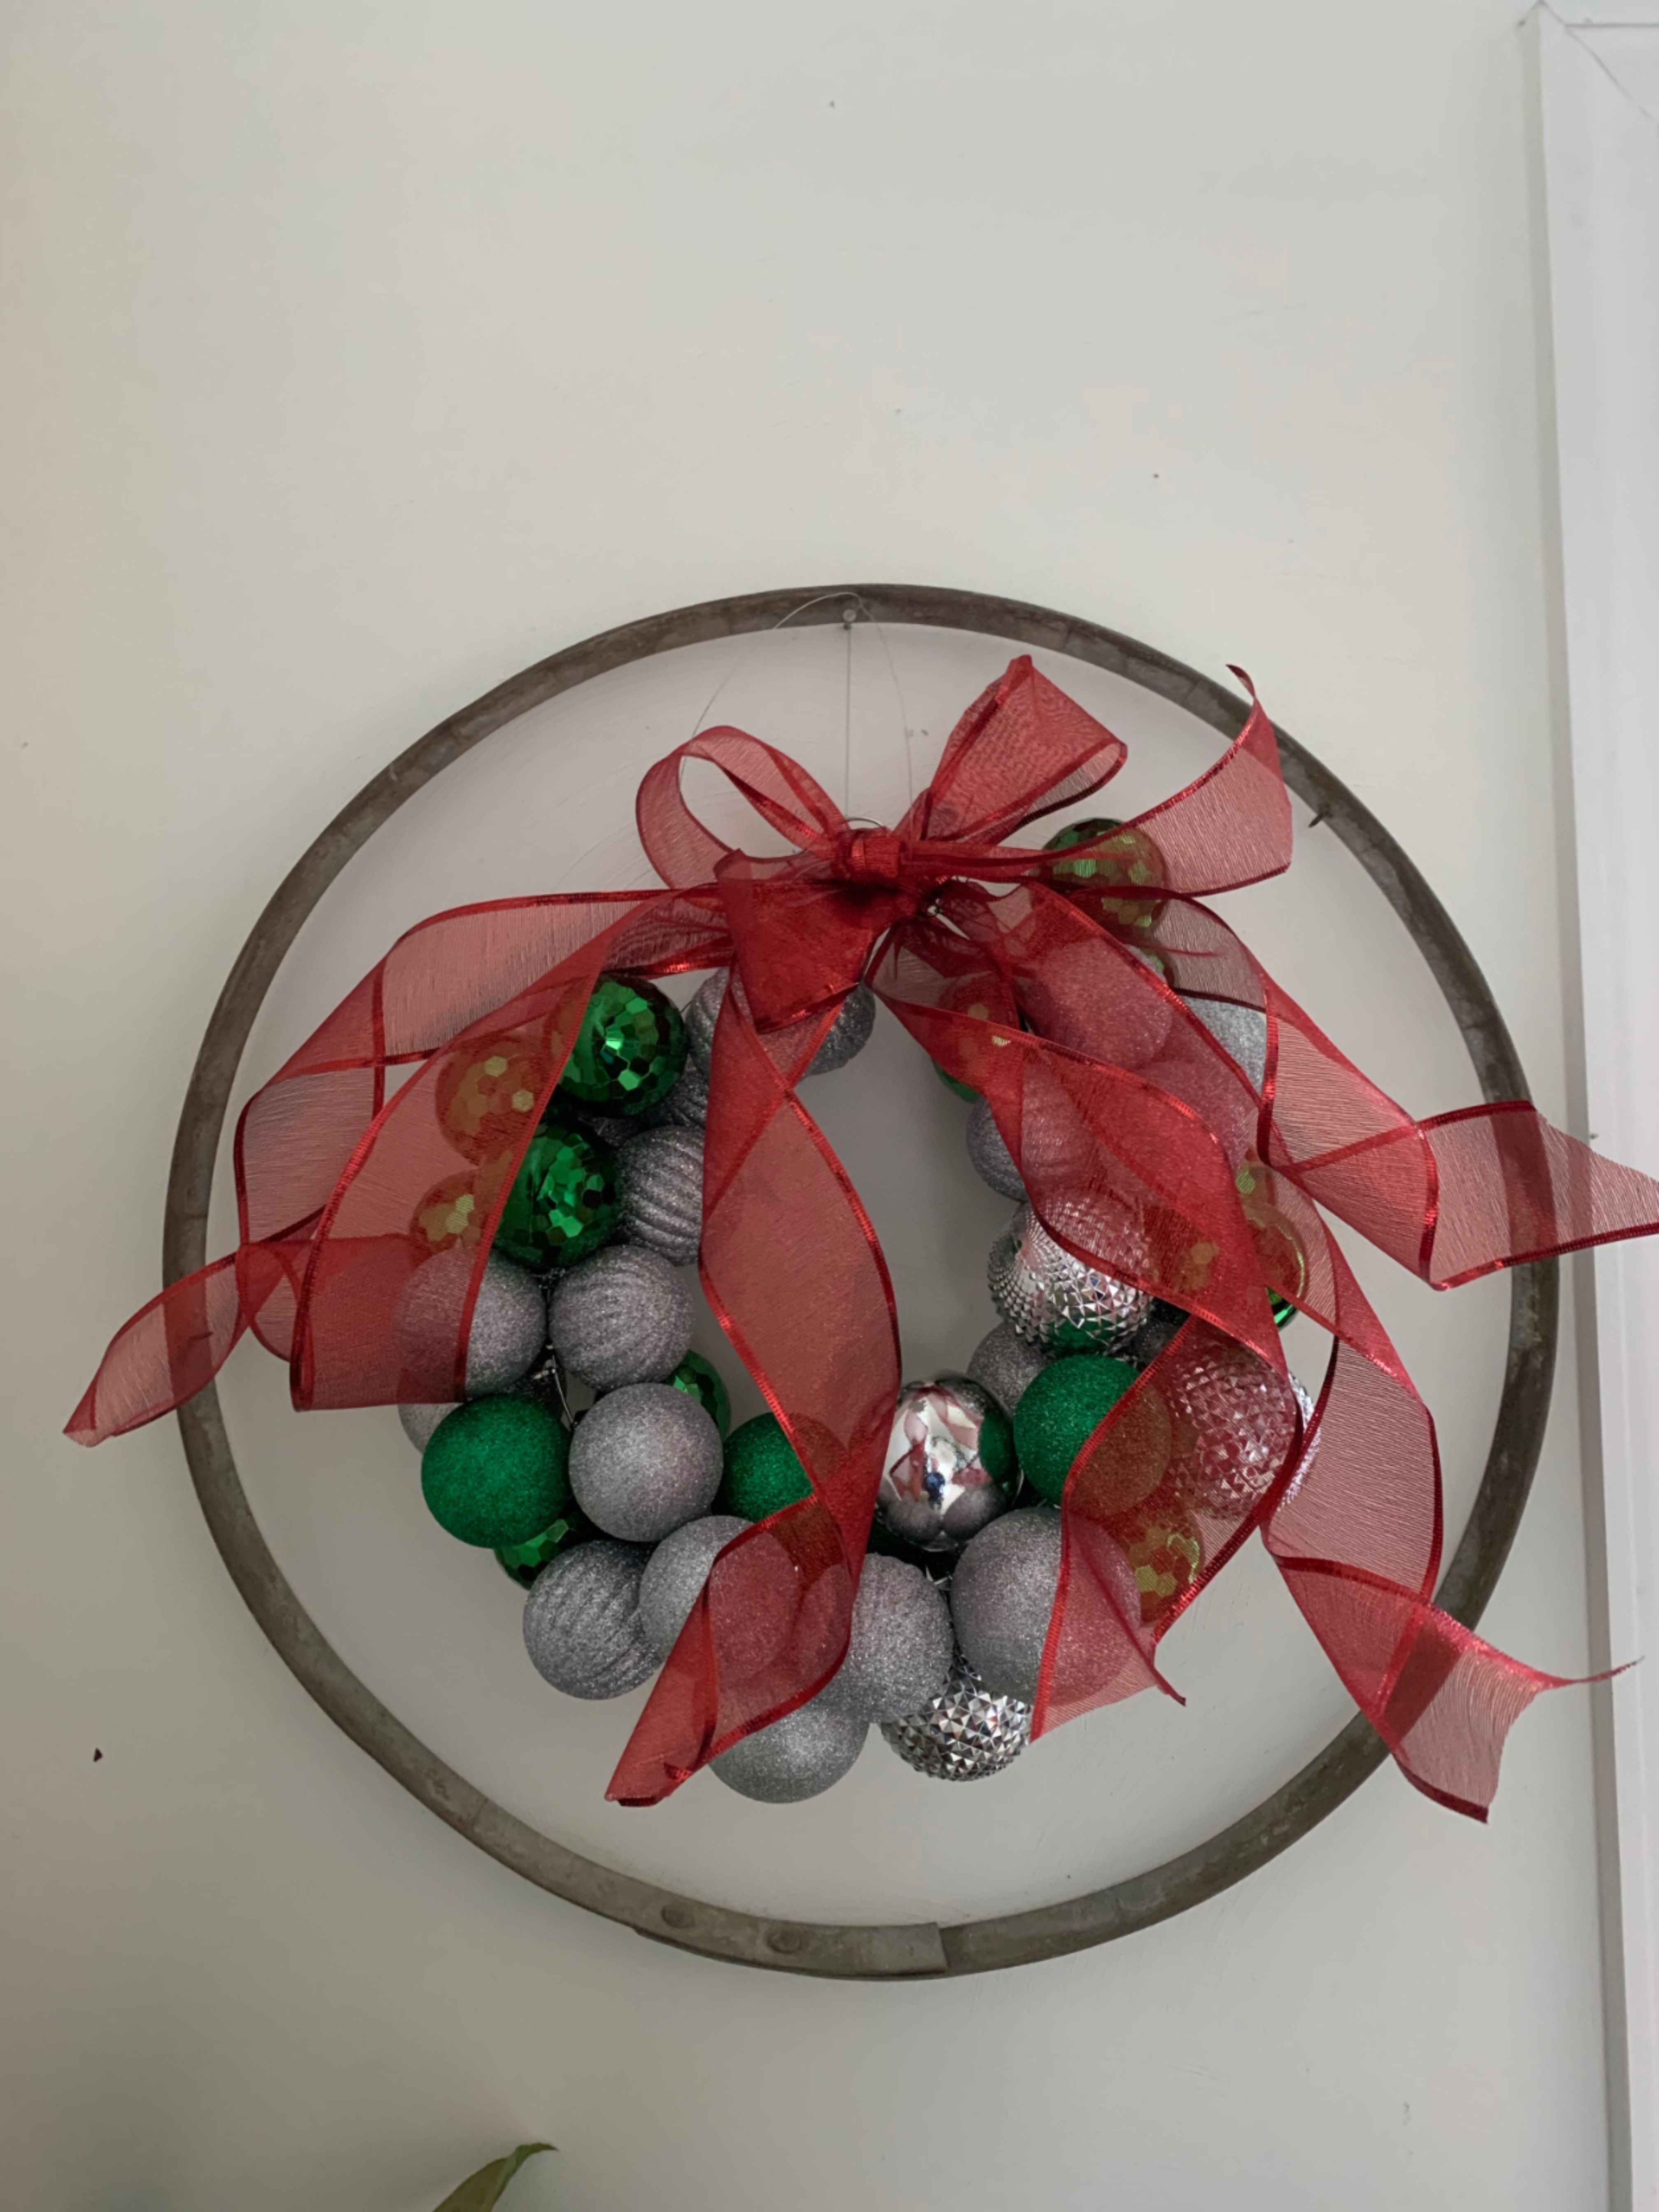 DIY Ornament Wreath Ornaments diy, Ornament wreath, Wreaths